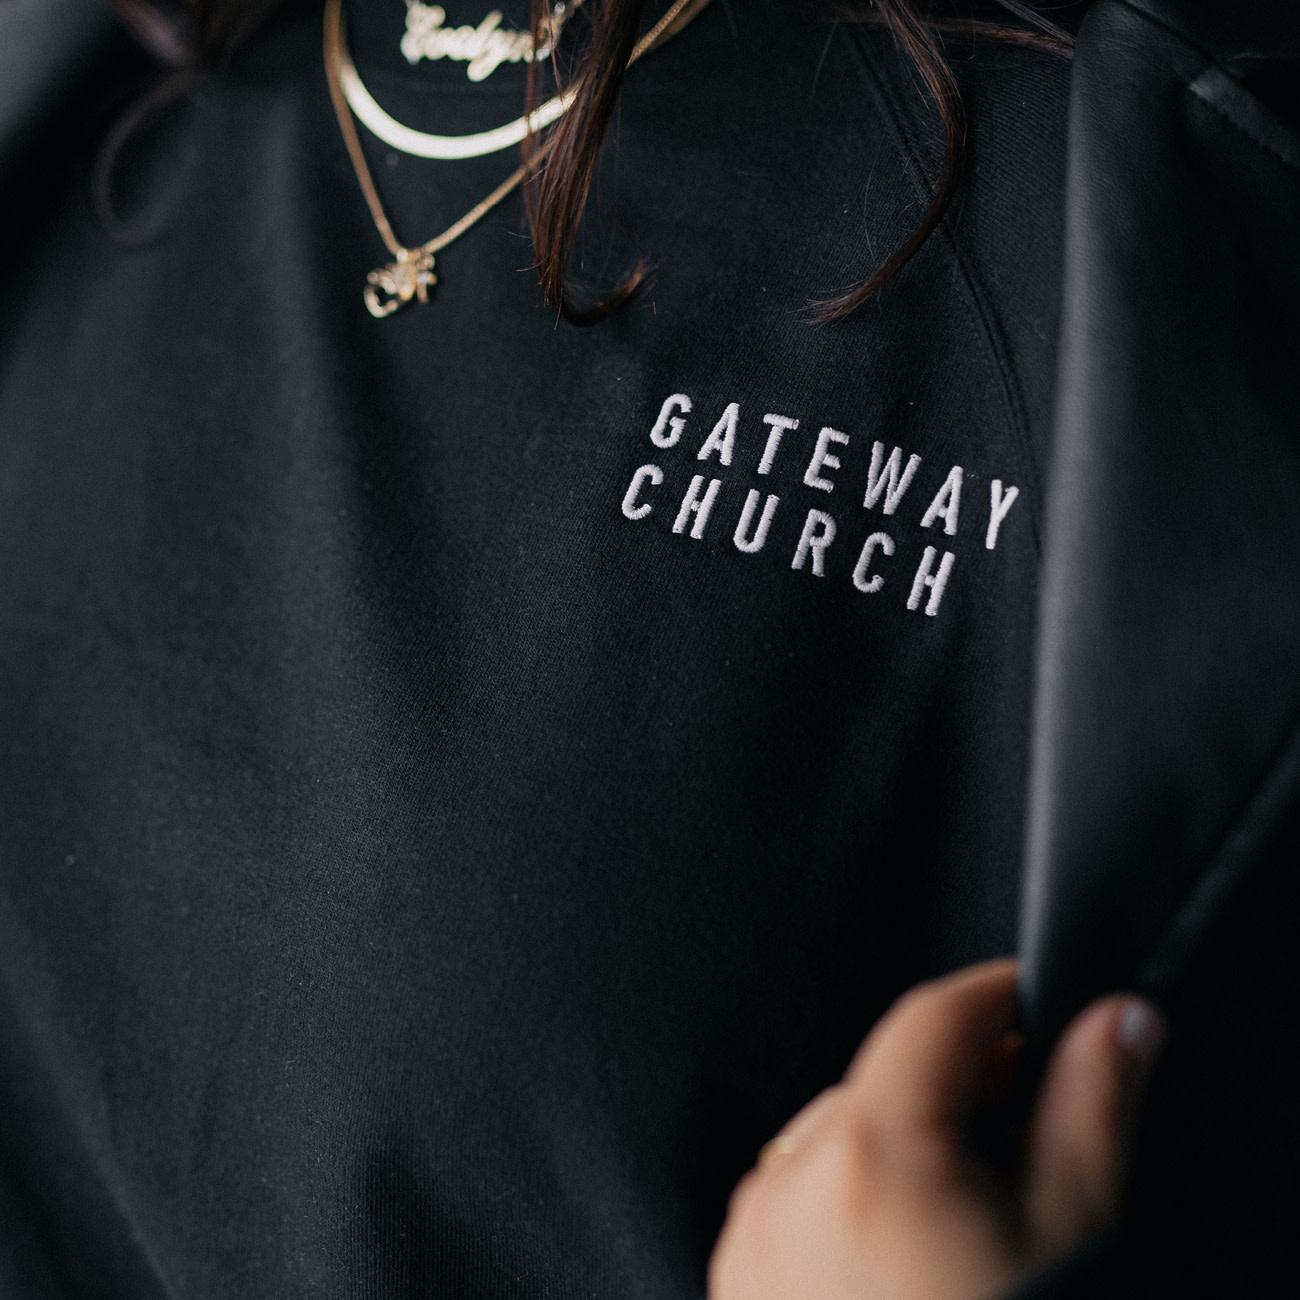 PRINTED THREADS Pullover - Gateway Church Black